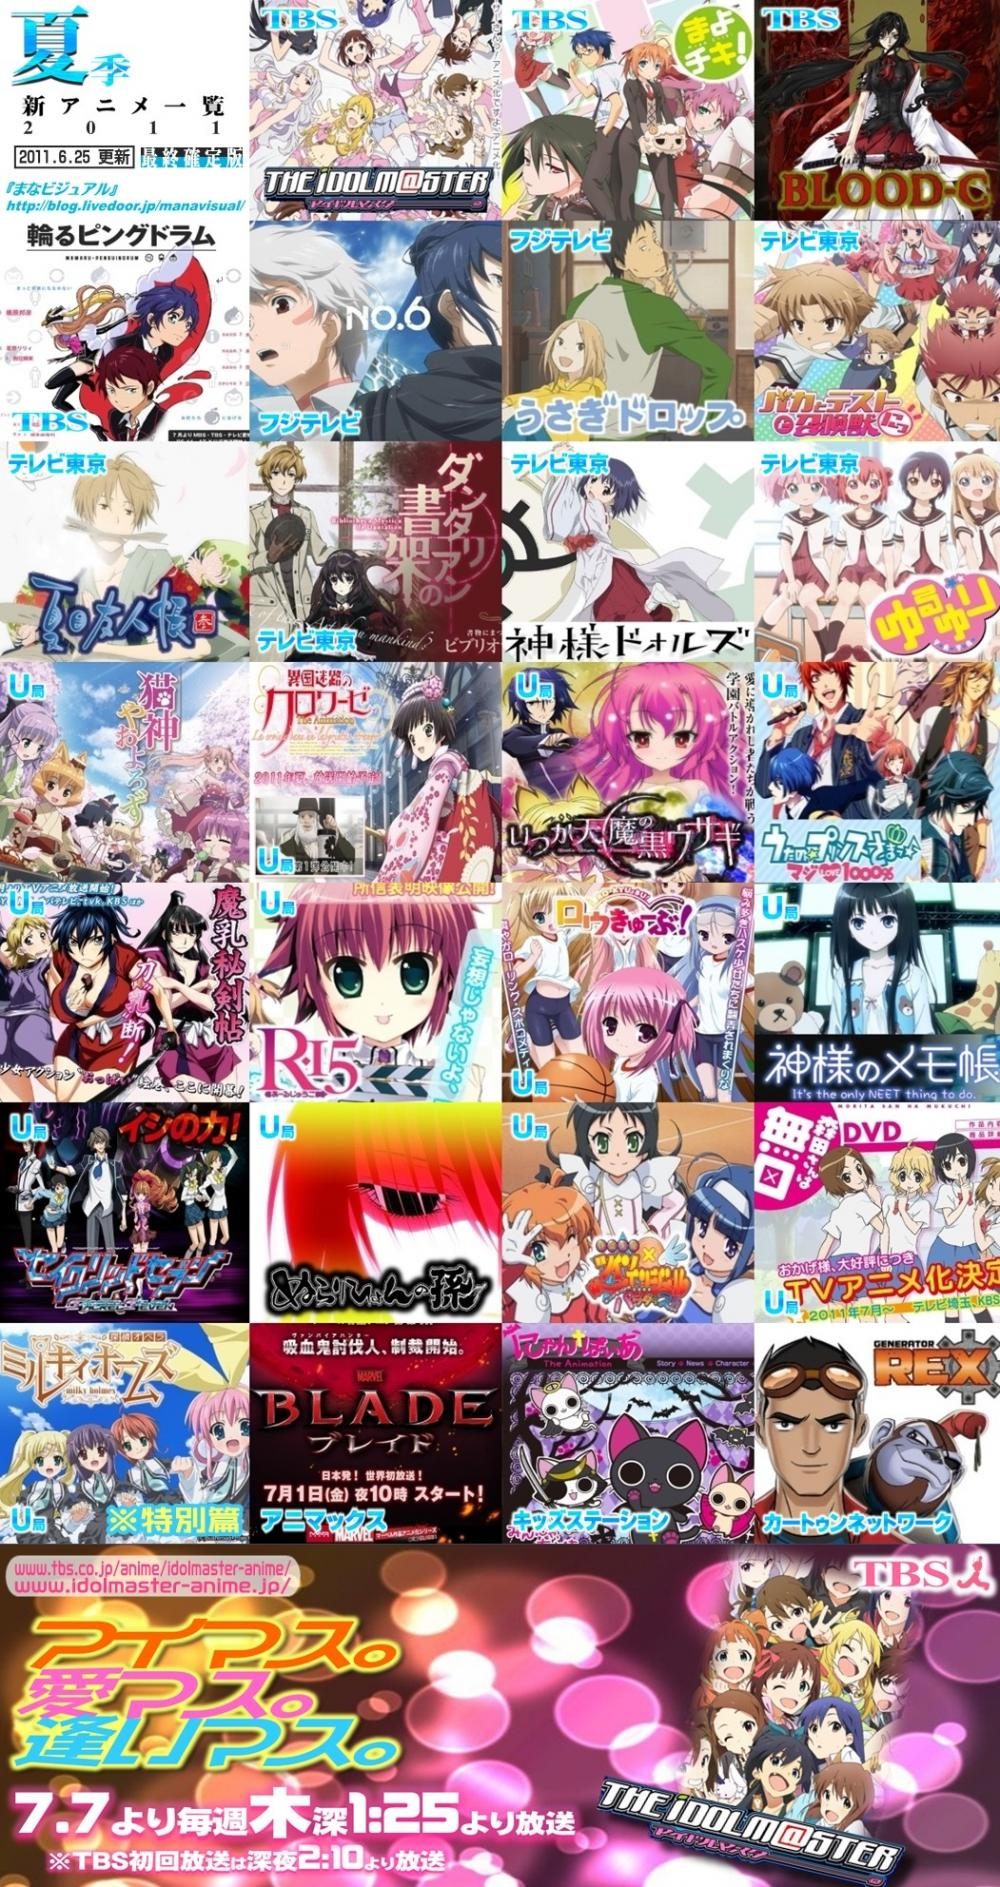 1469f762(2)_convert_20110627035139.jpg